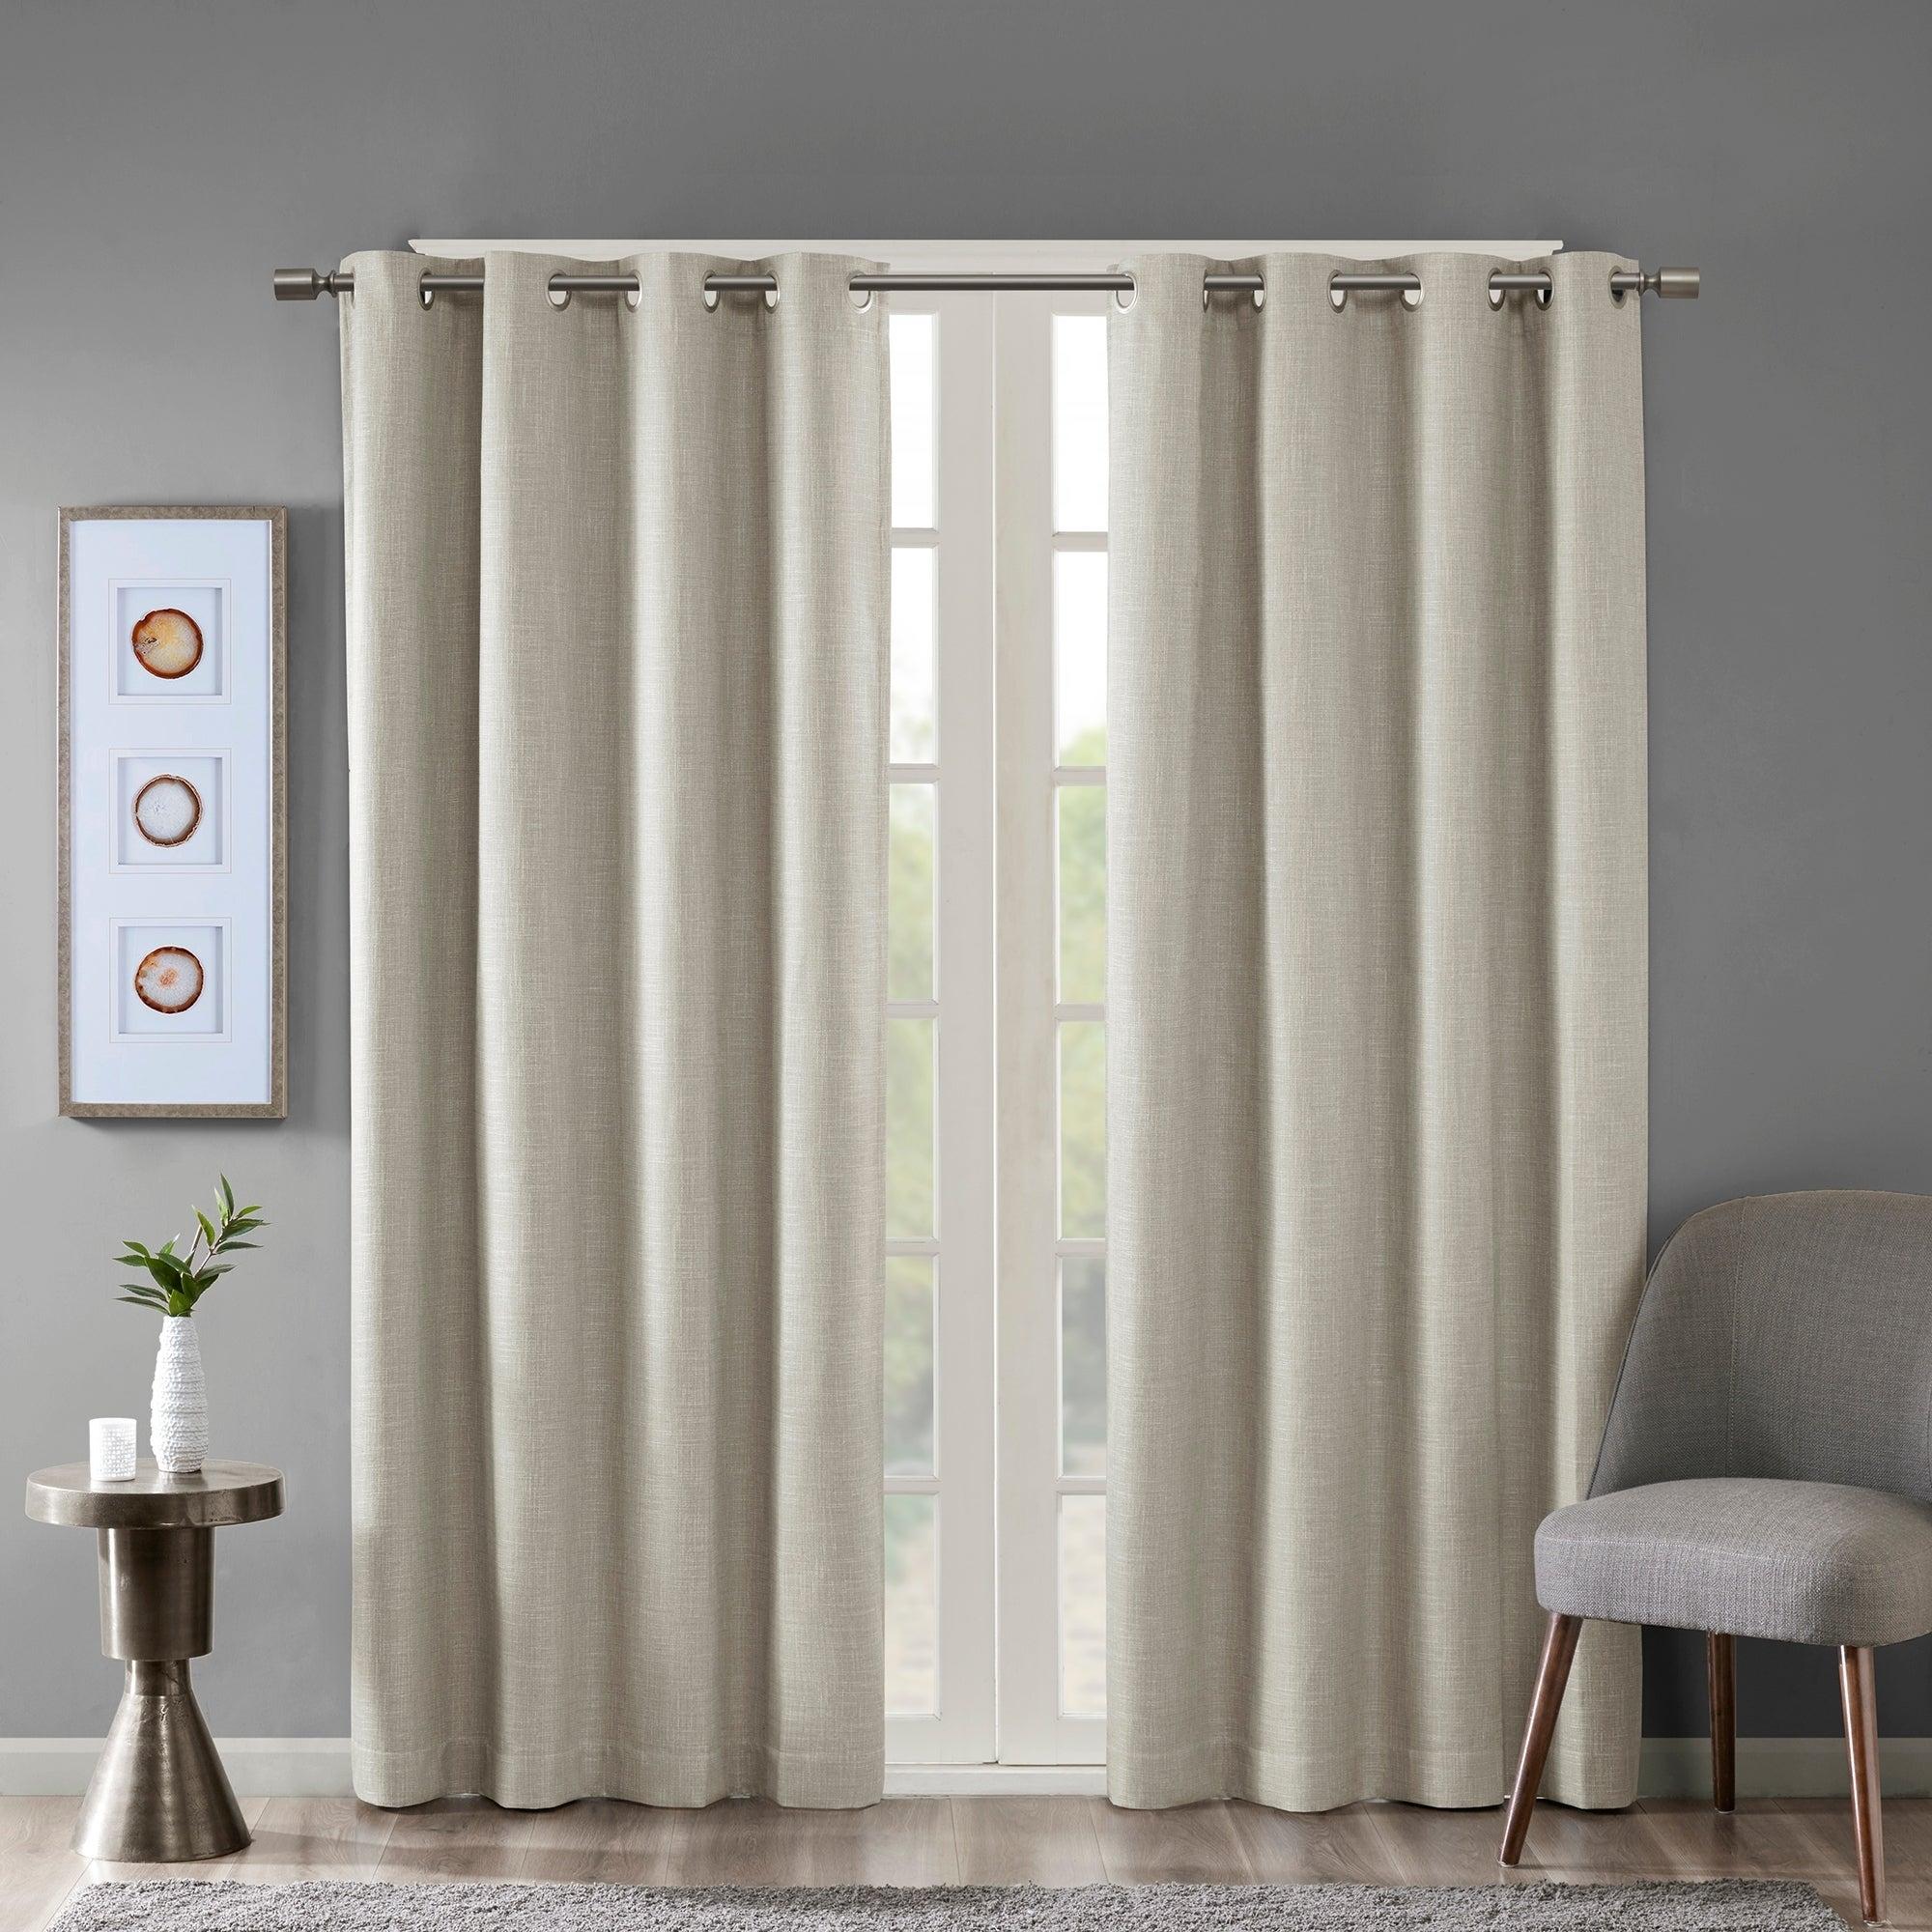 Sunsmart Arlie Printed Heathered Blackout Single Window Curtain Panel 4 Color Option With Hayden Grommet Blackout Single Curtain Panels (View 18 of 20)